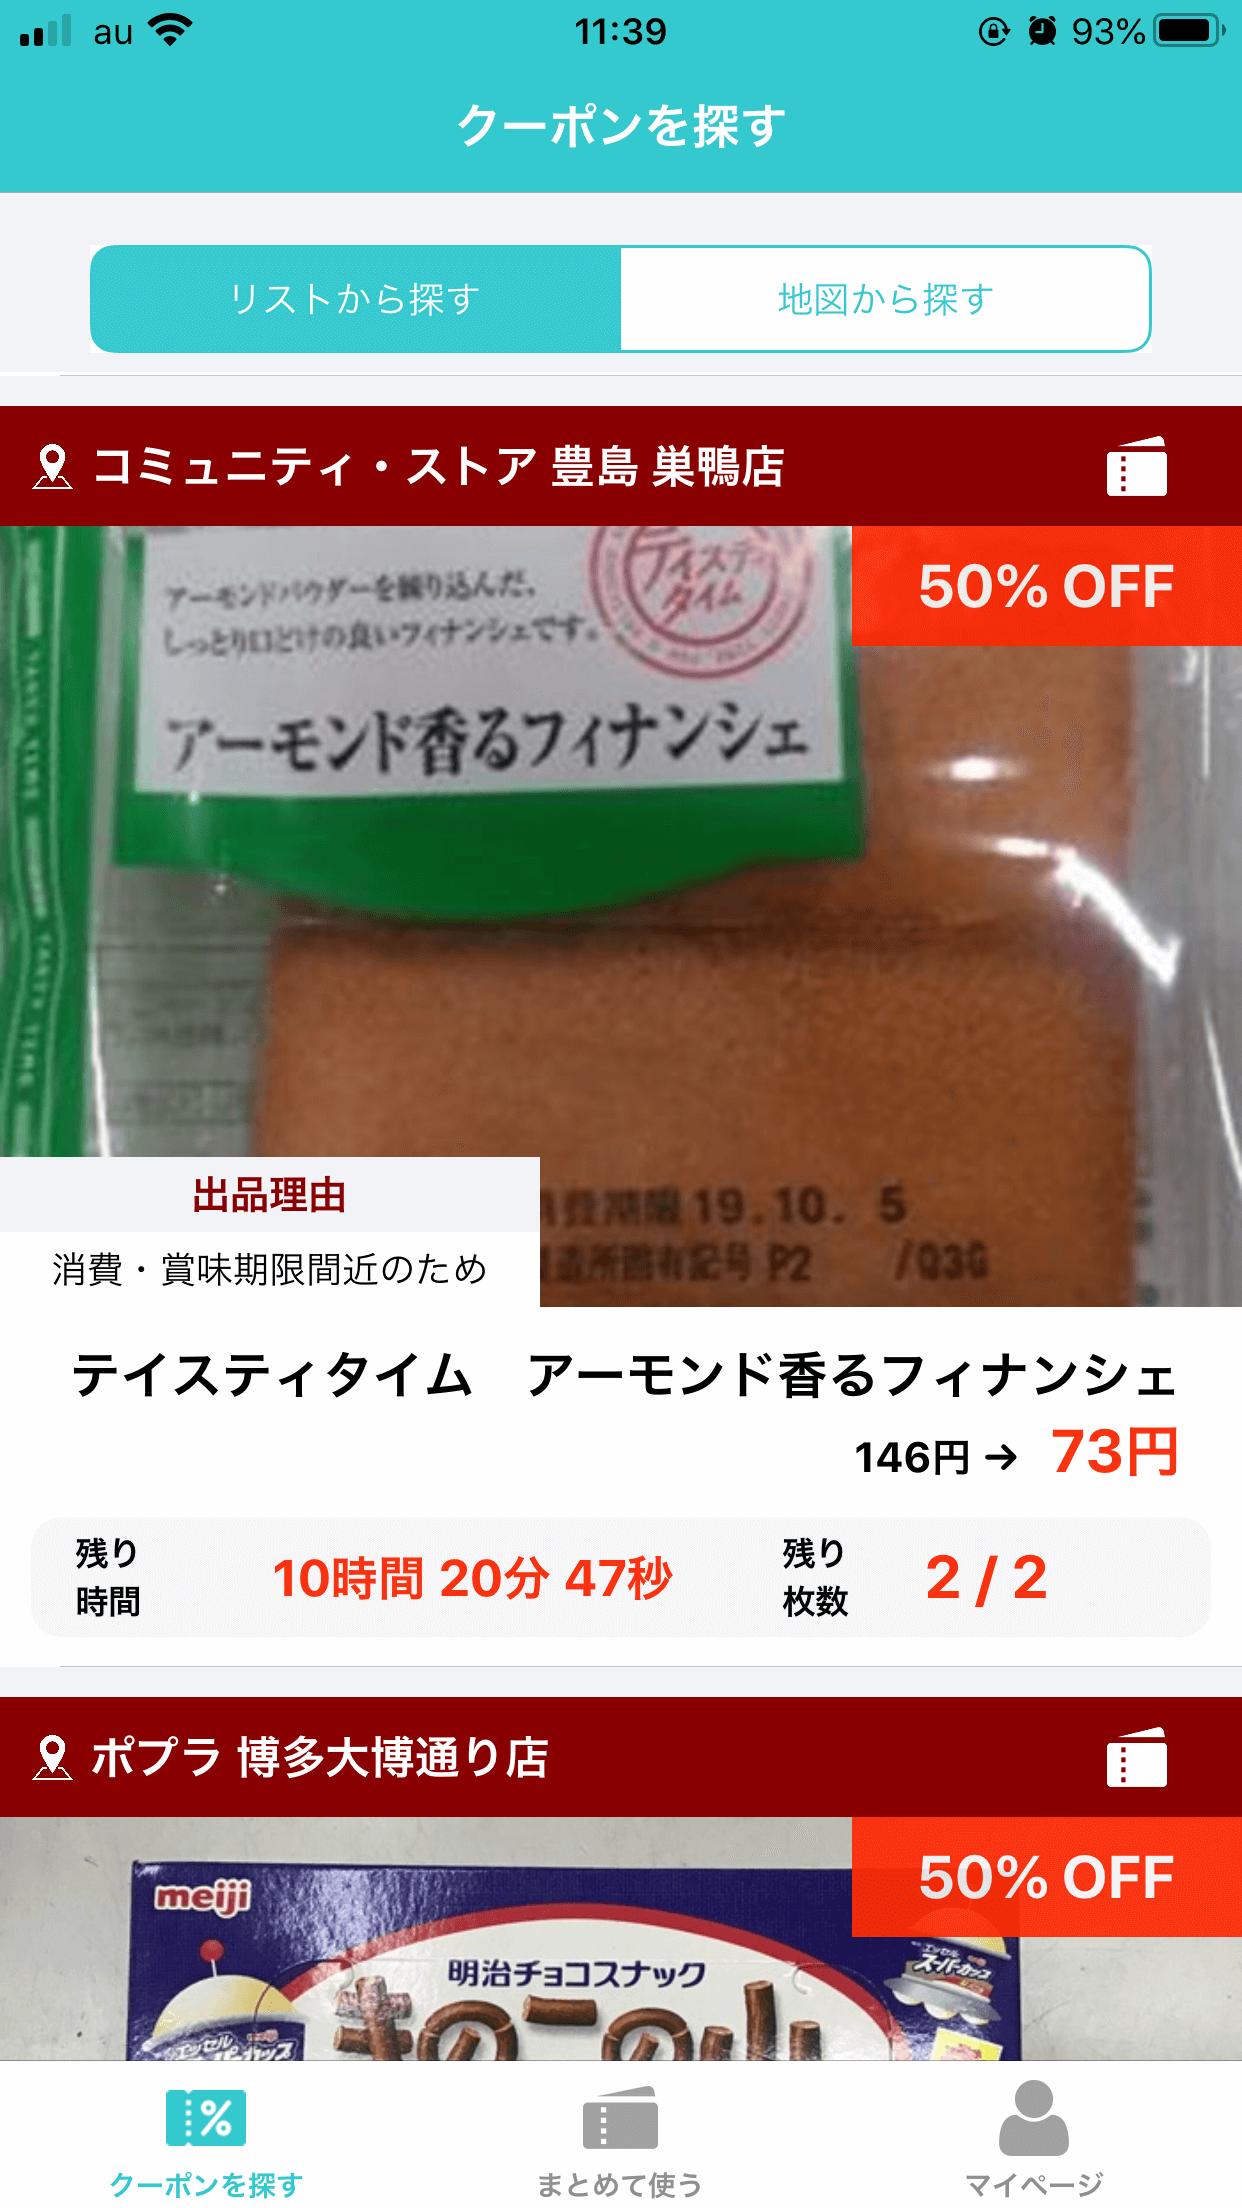 No Food Loss クーポン商品例②